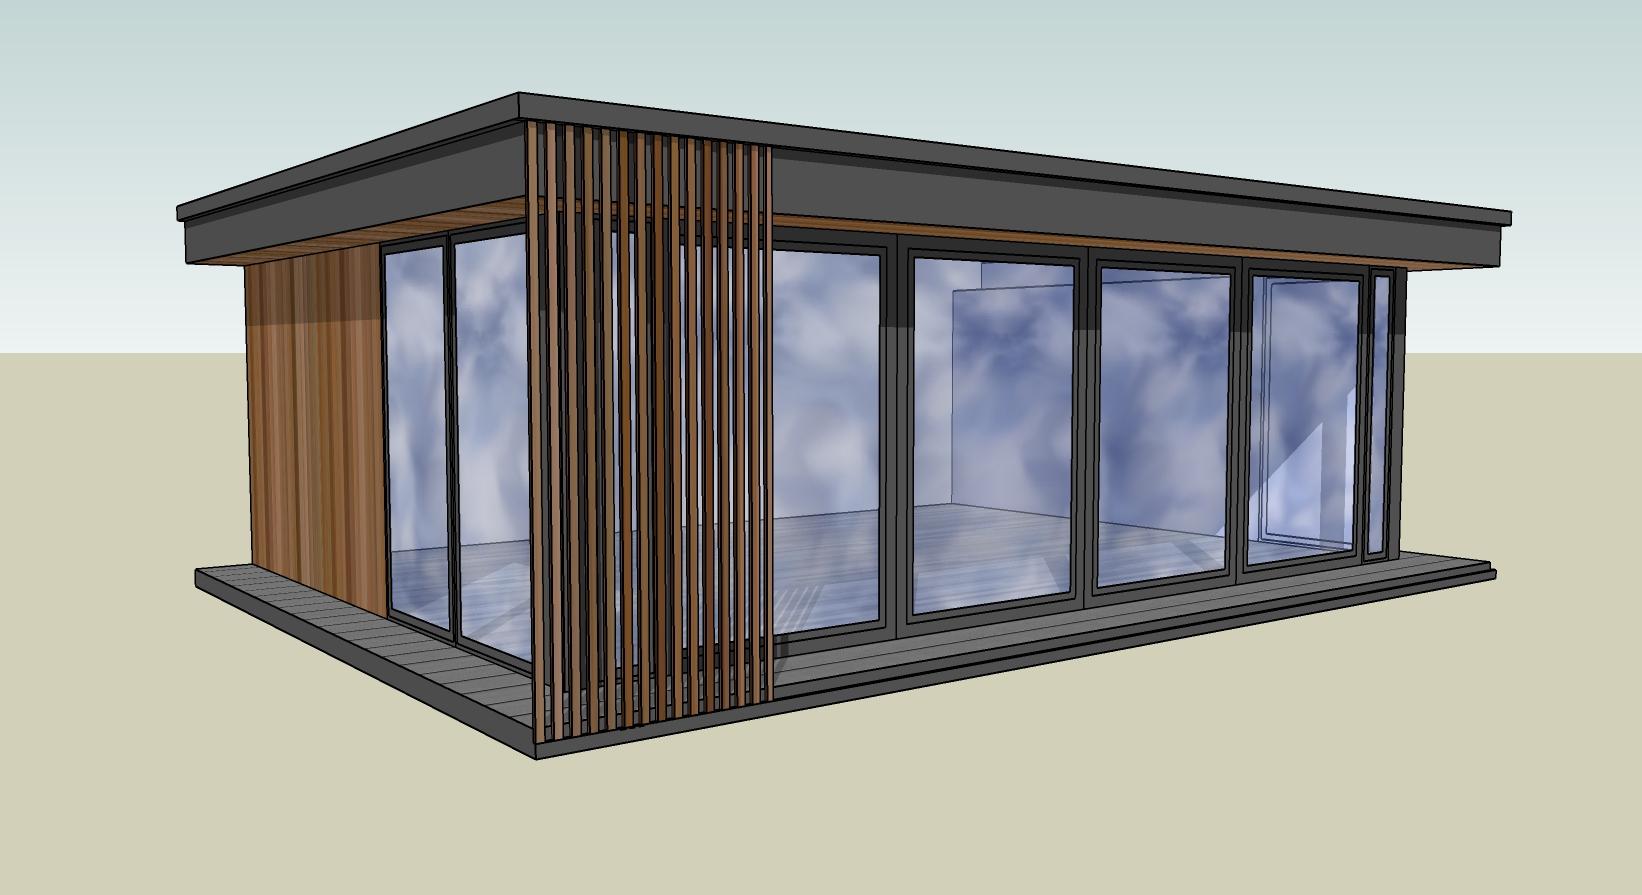 garden room design drawing